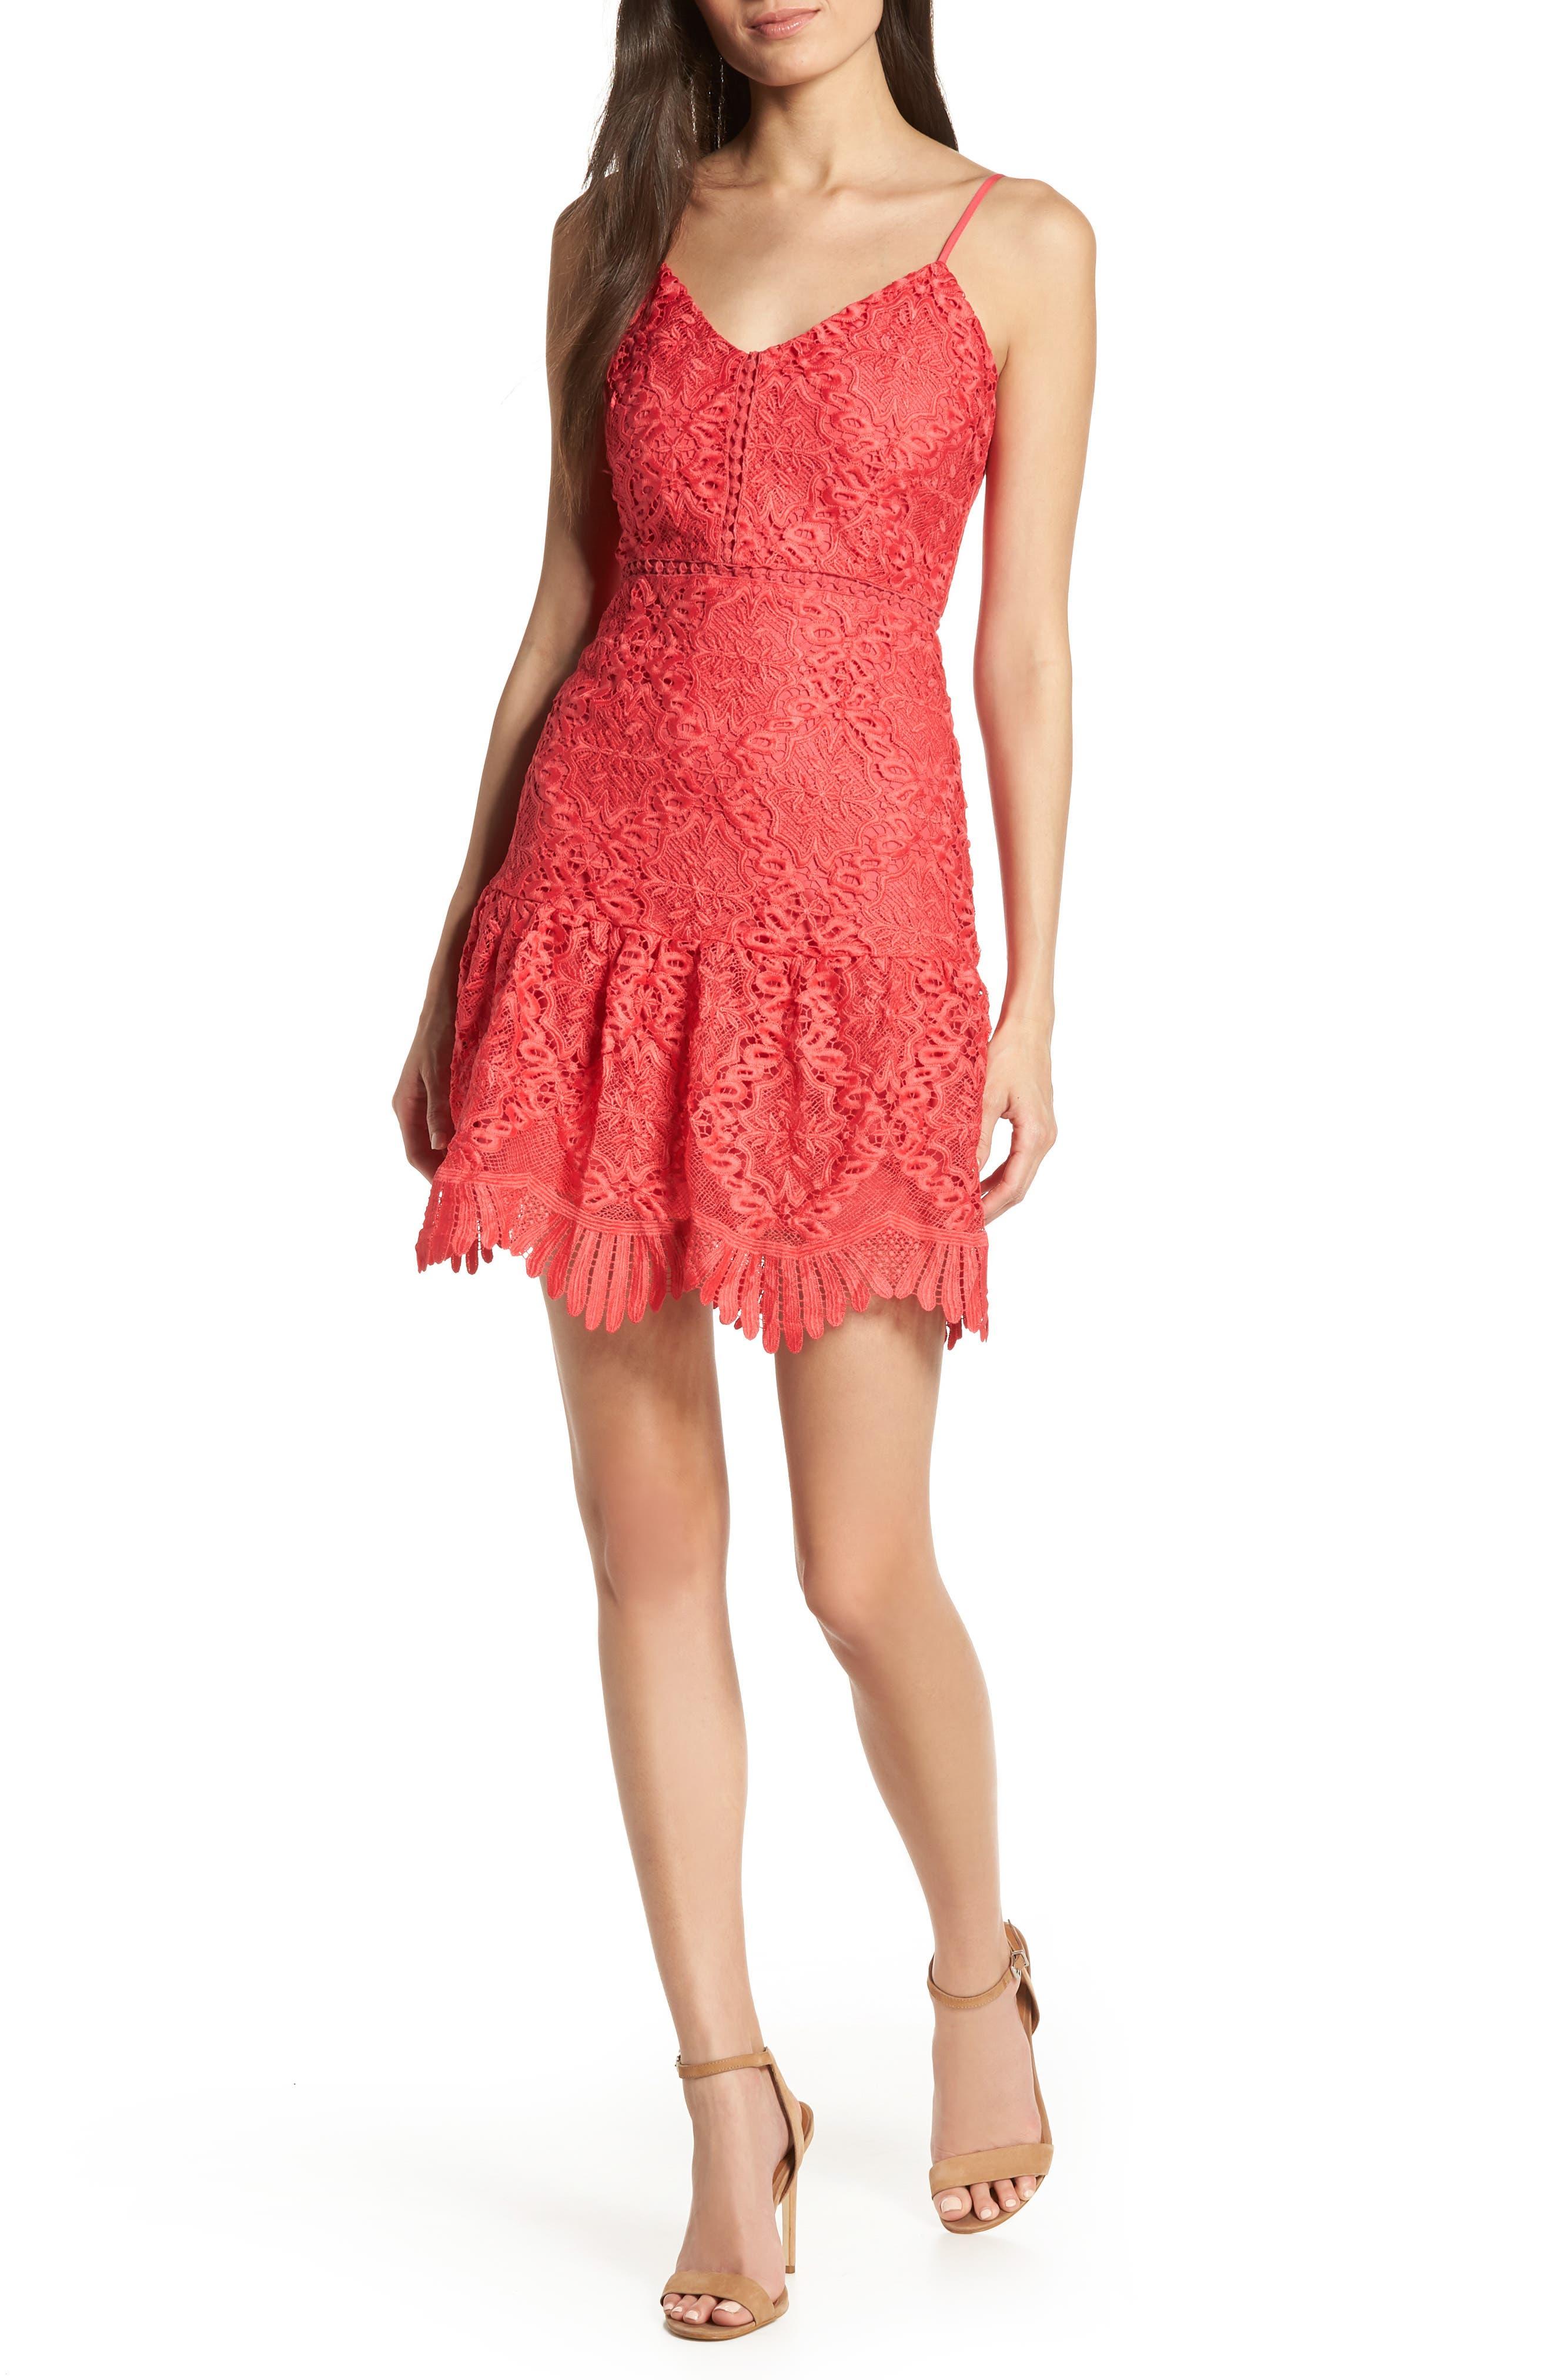 Bb Dakota Party Has Arrived Scallop Lace Sundress, Pink